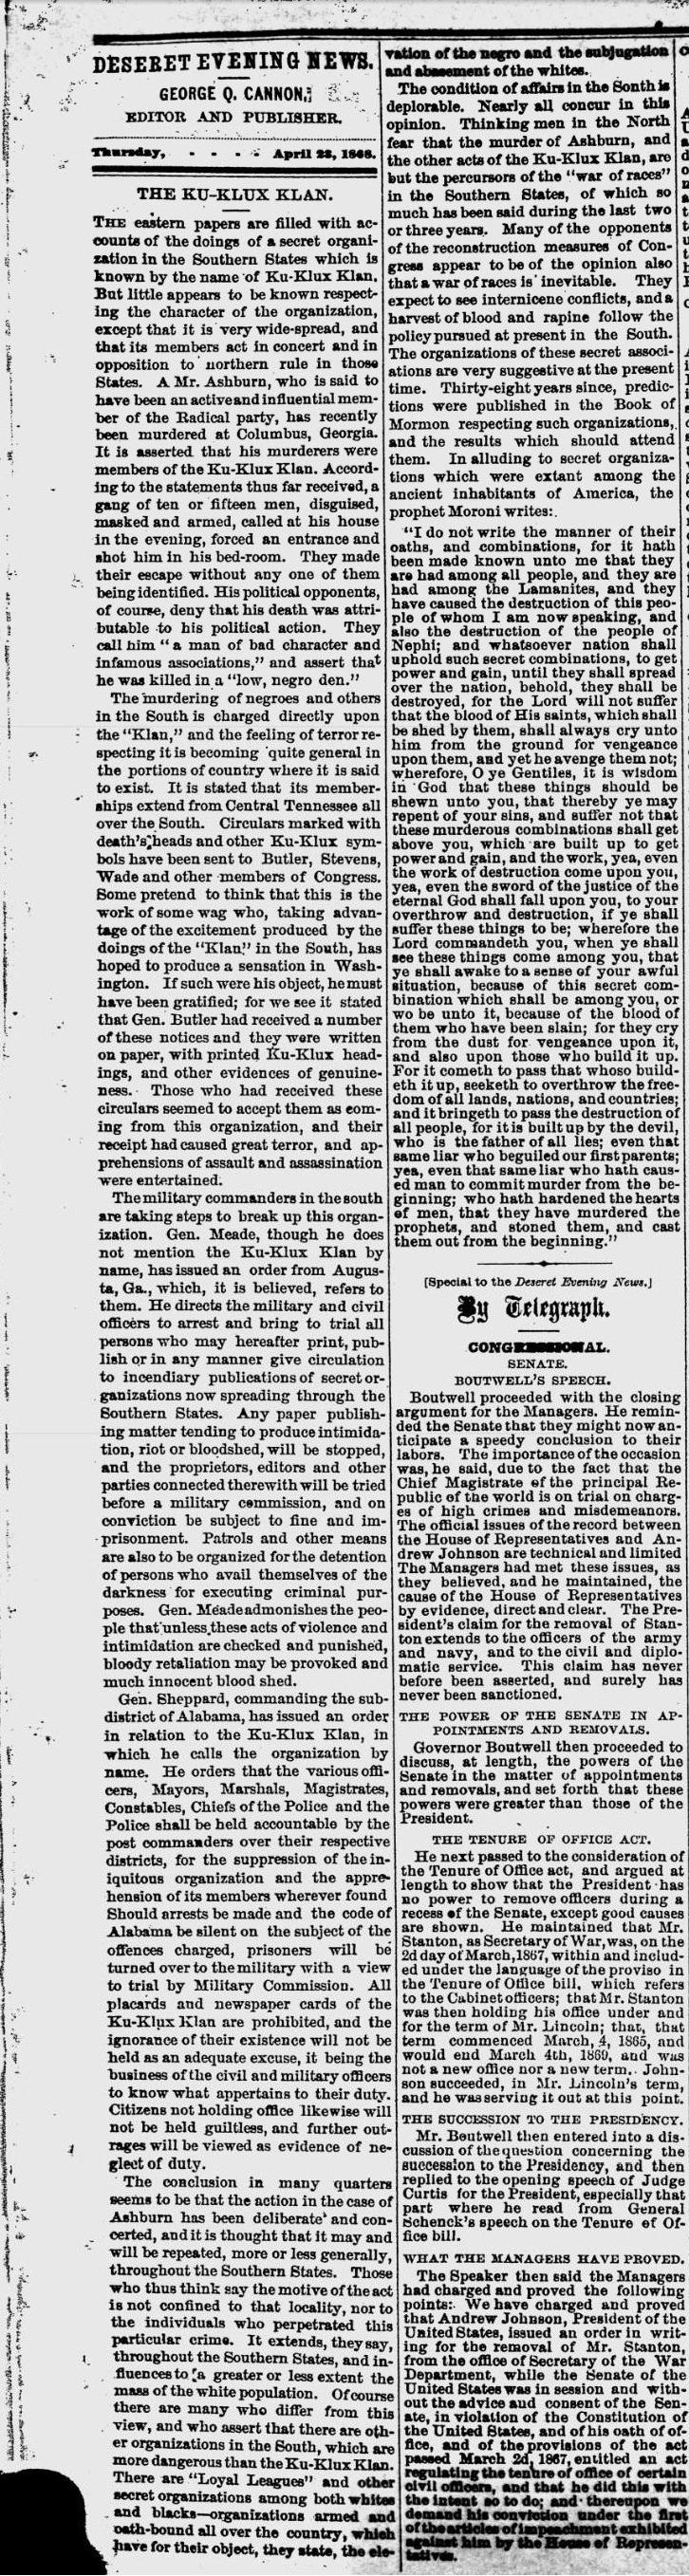 ku klux klan mormonite musings dn apr 23 1868 george cannon kkk